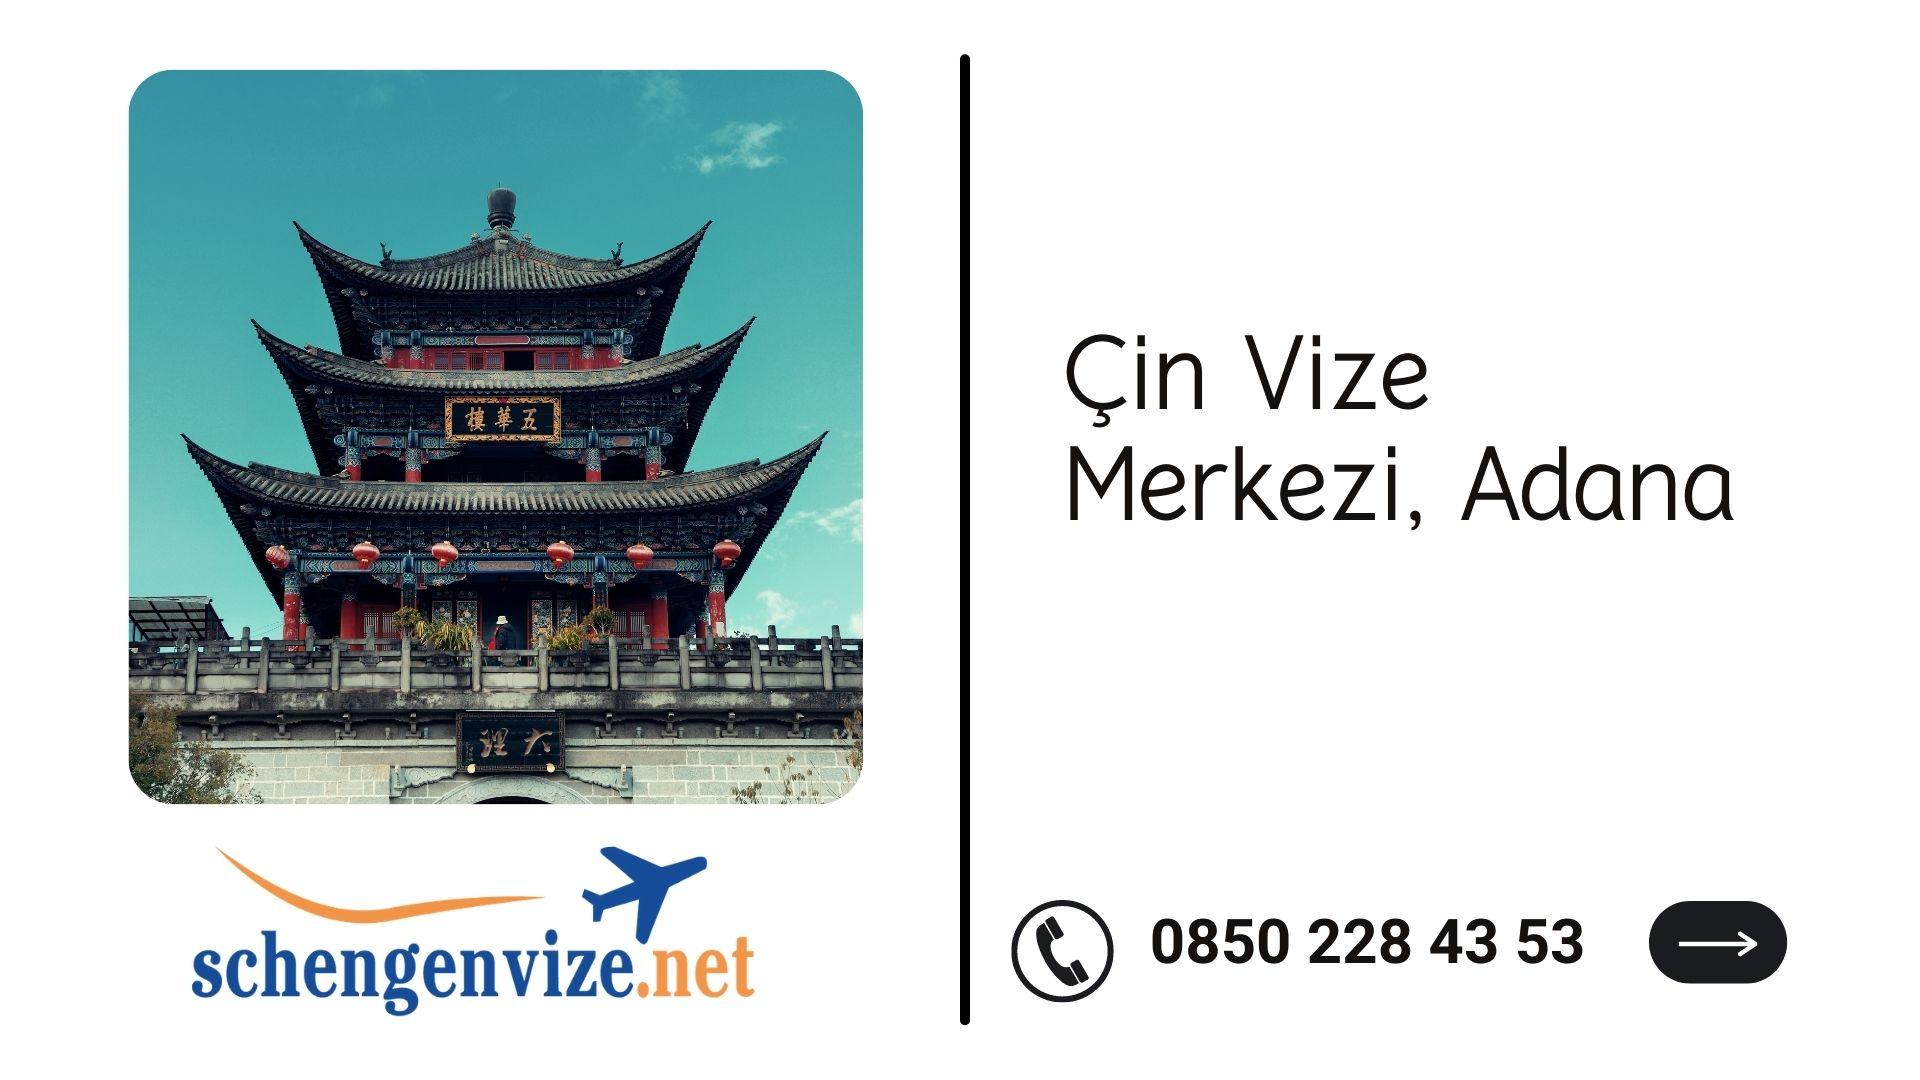 Çin Vize Merkezi, Adana